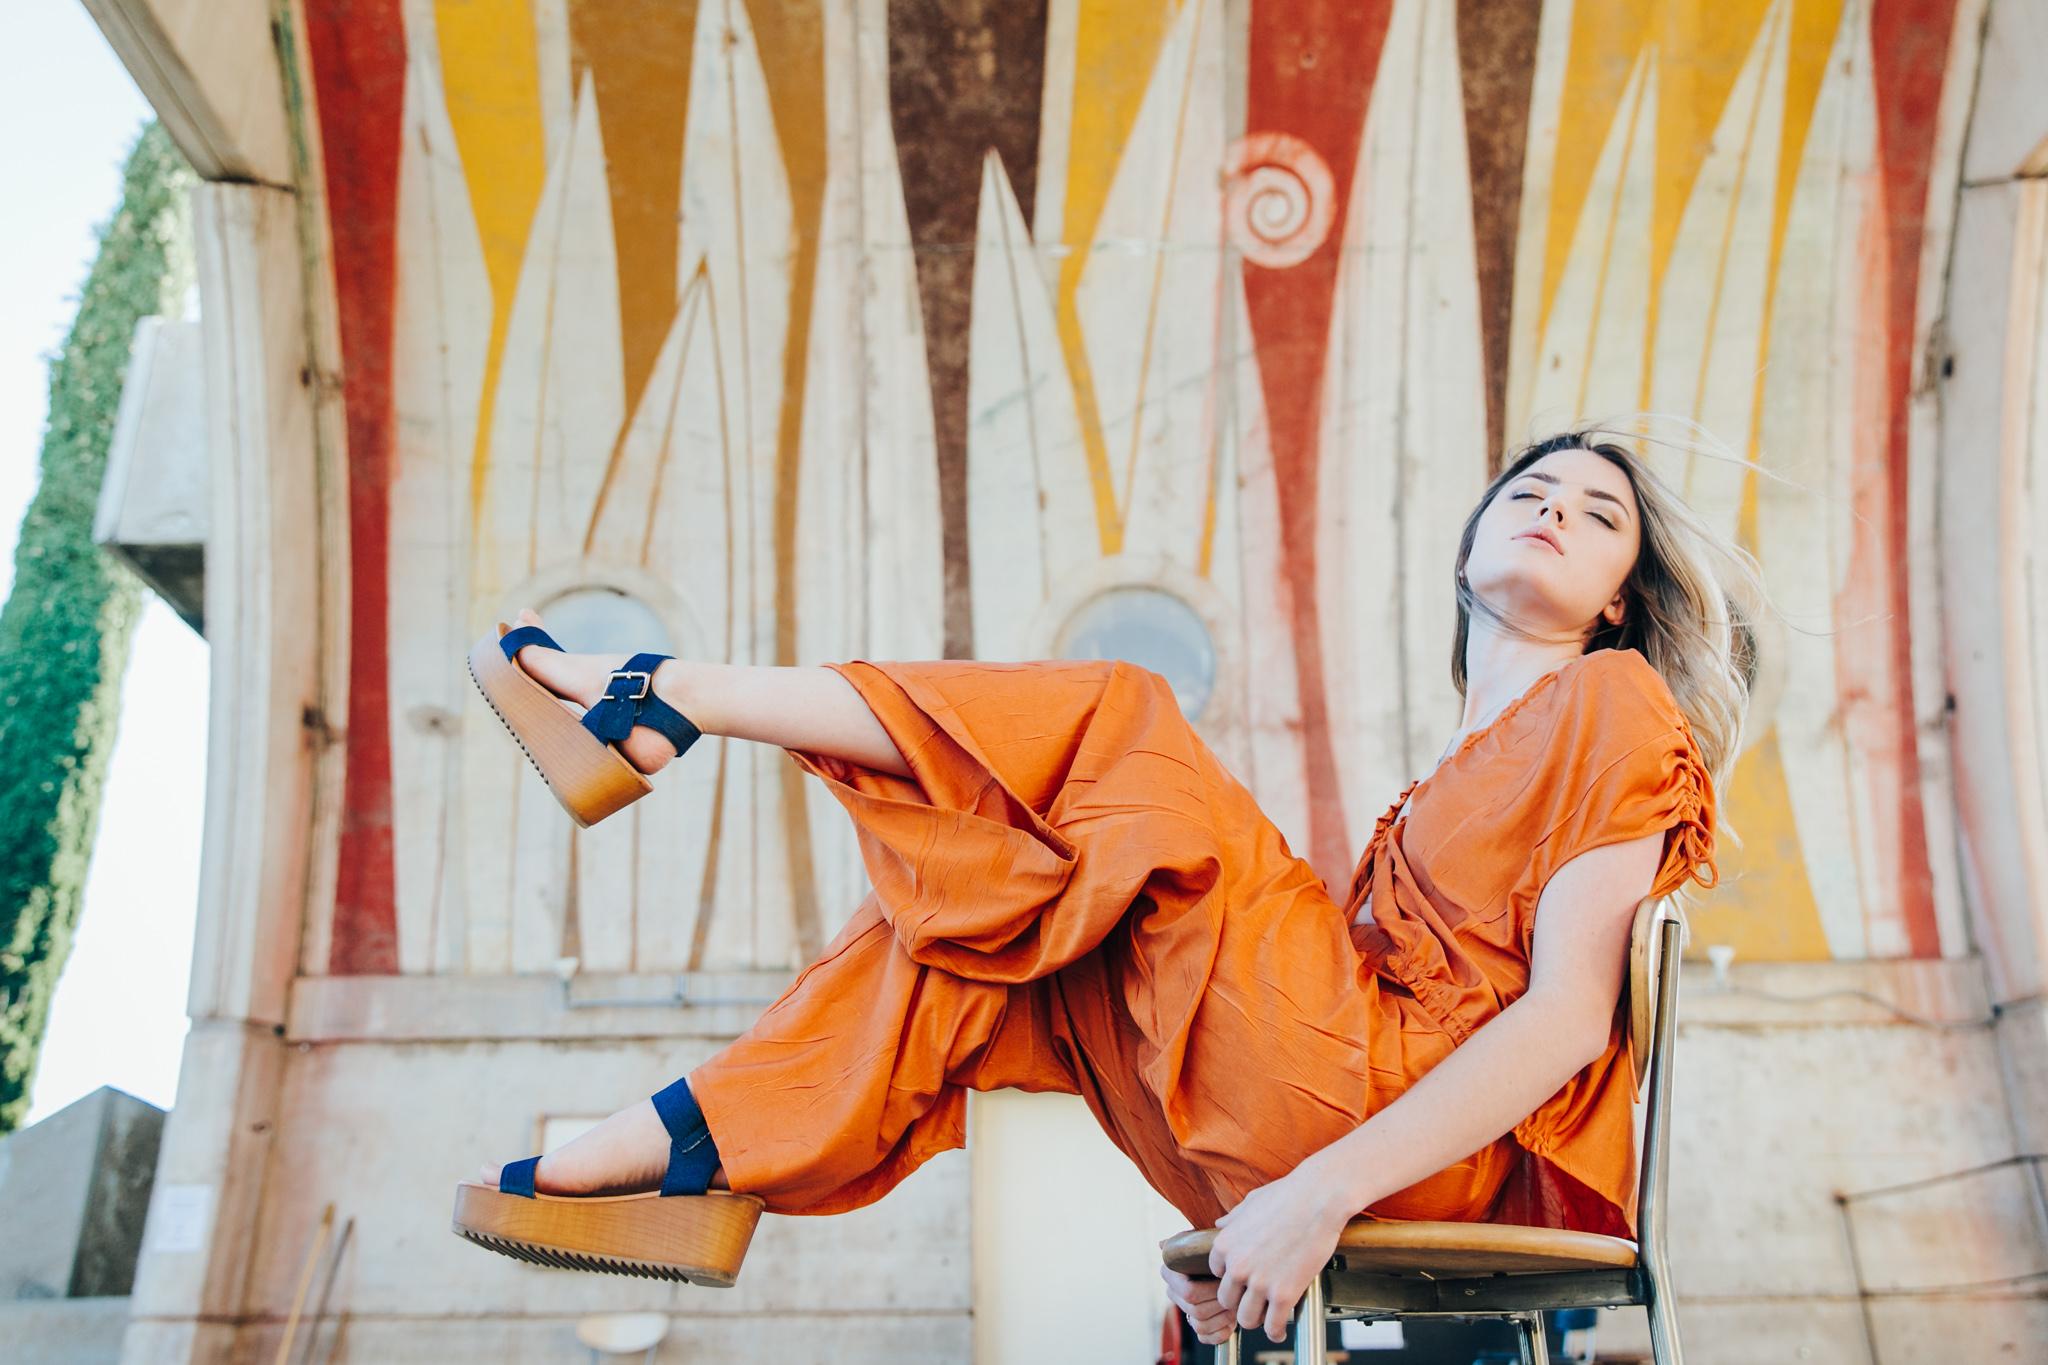 ChelseaScottEvans-Arcosanti-045.jpg